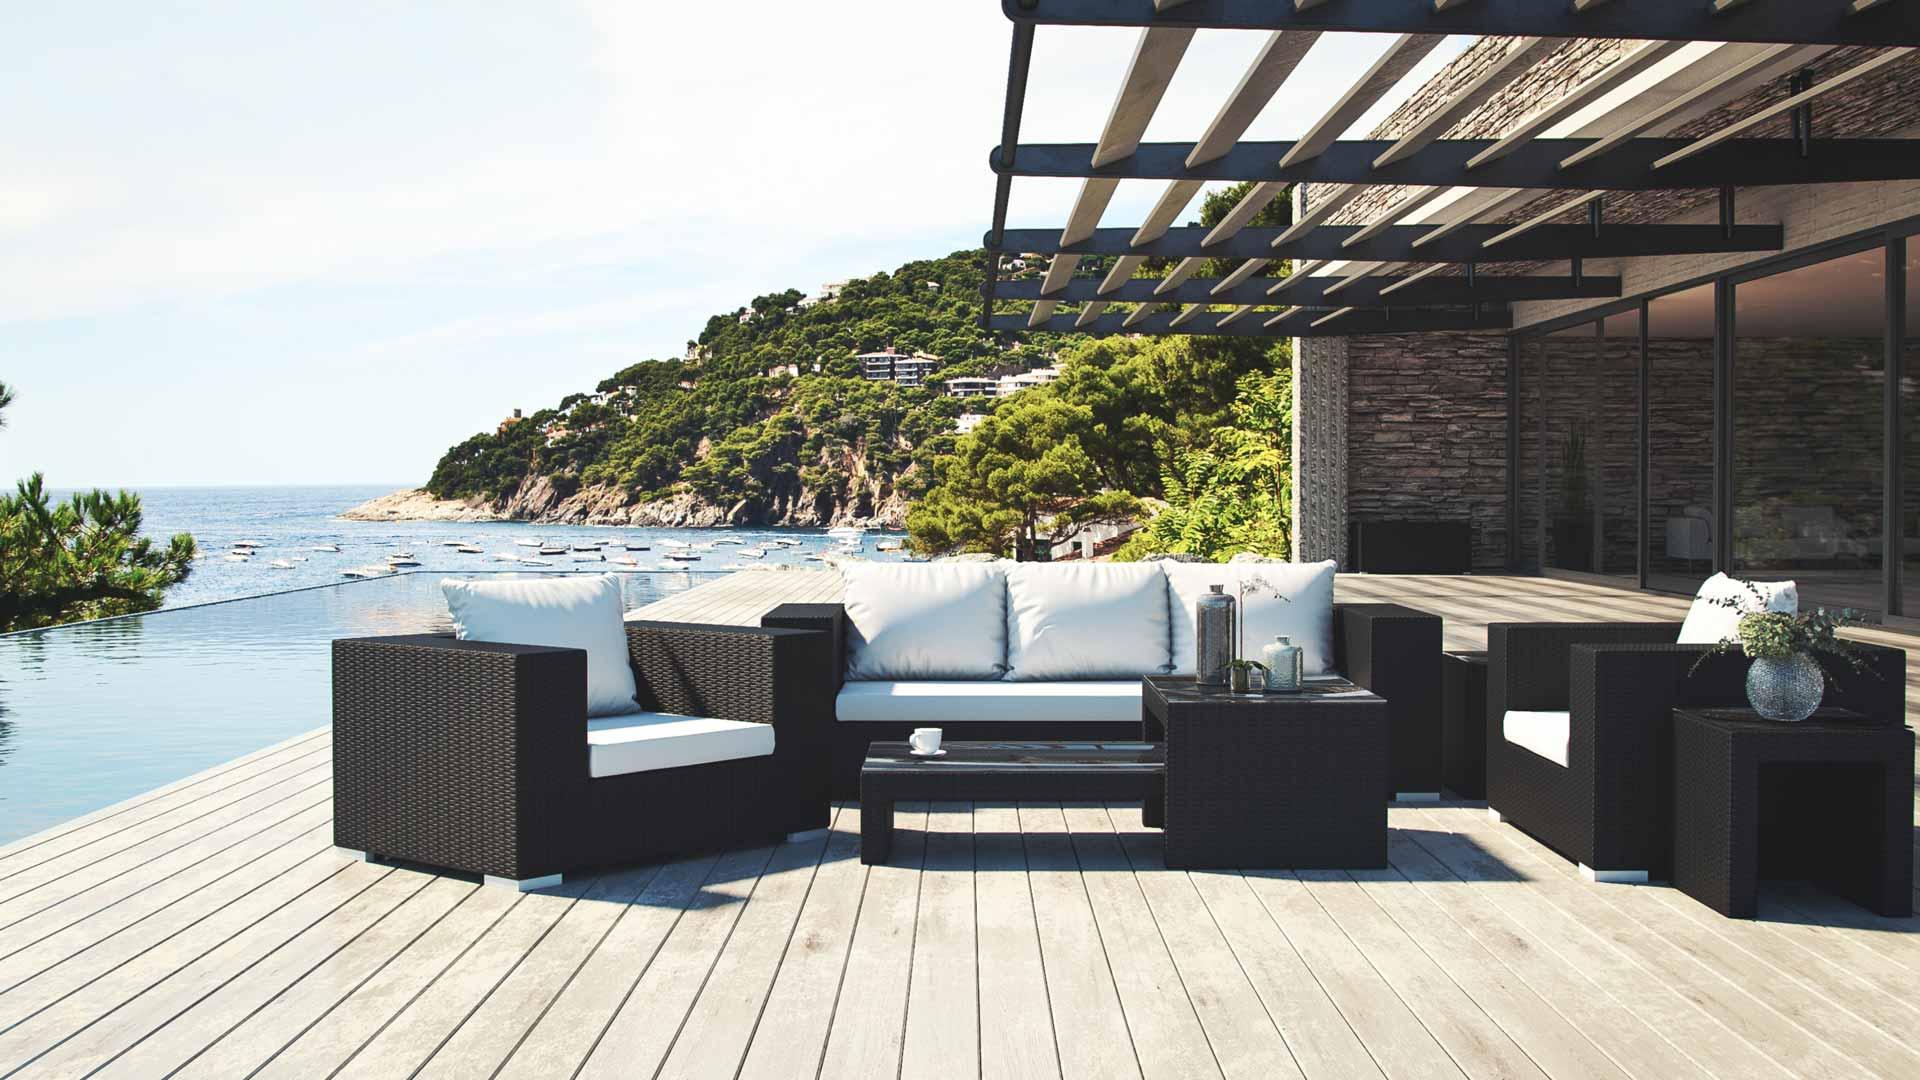 Artelia fr salon de jardin moderne resin tress e matelia for Salon de jardin moderne